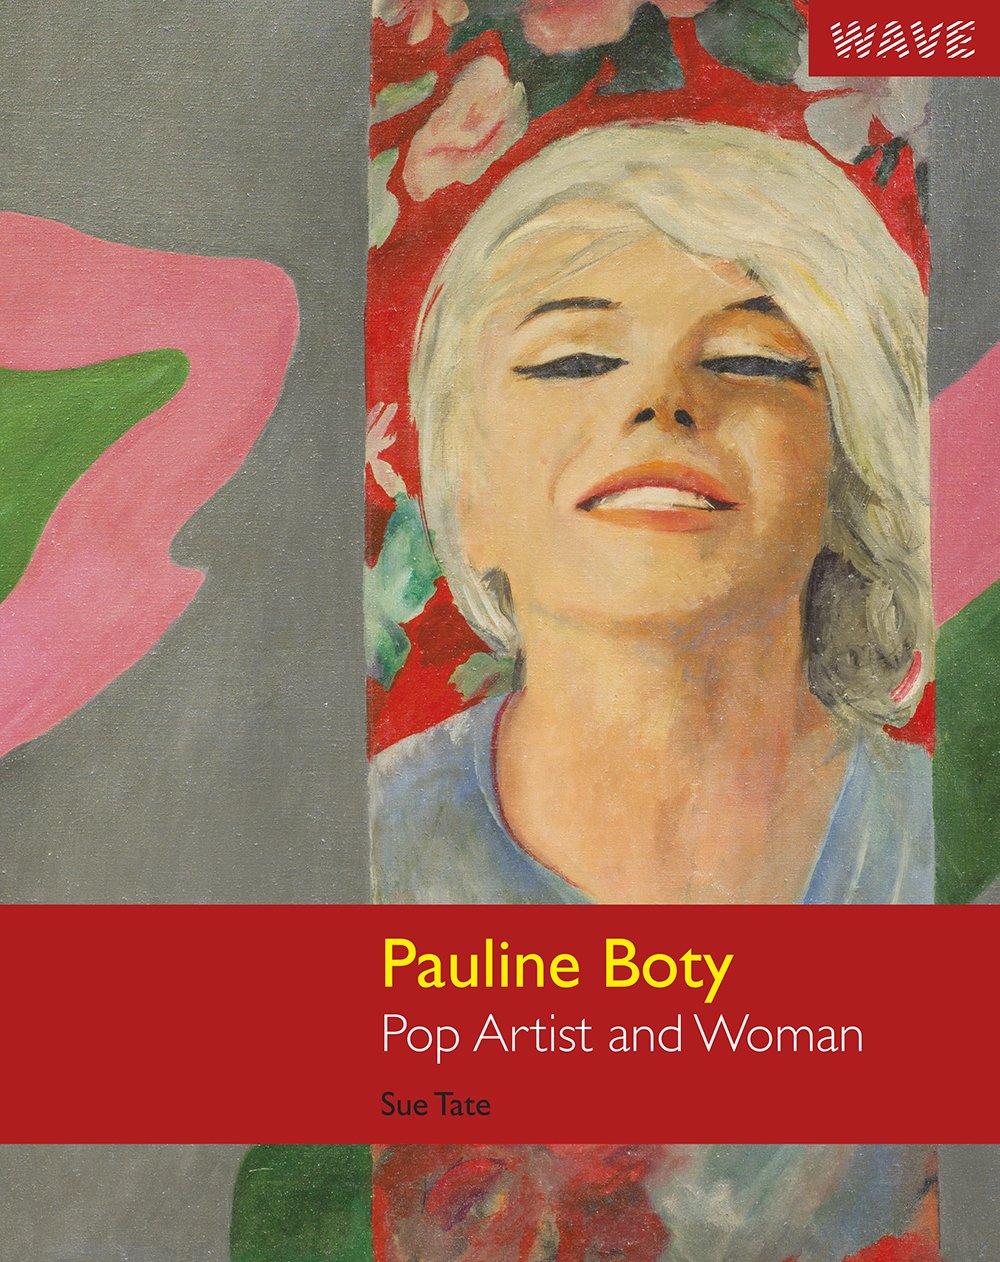 Pauline Boty: Pop Artist and Woman Paperback – 1 Jan 2013